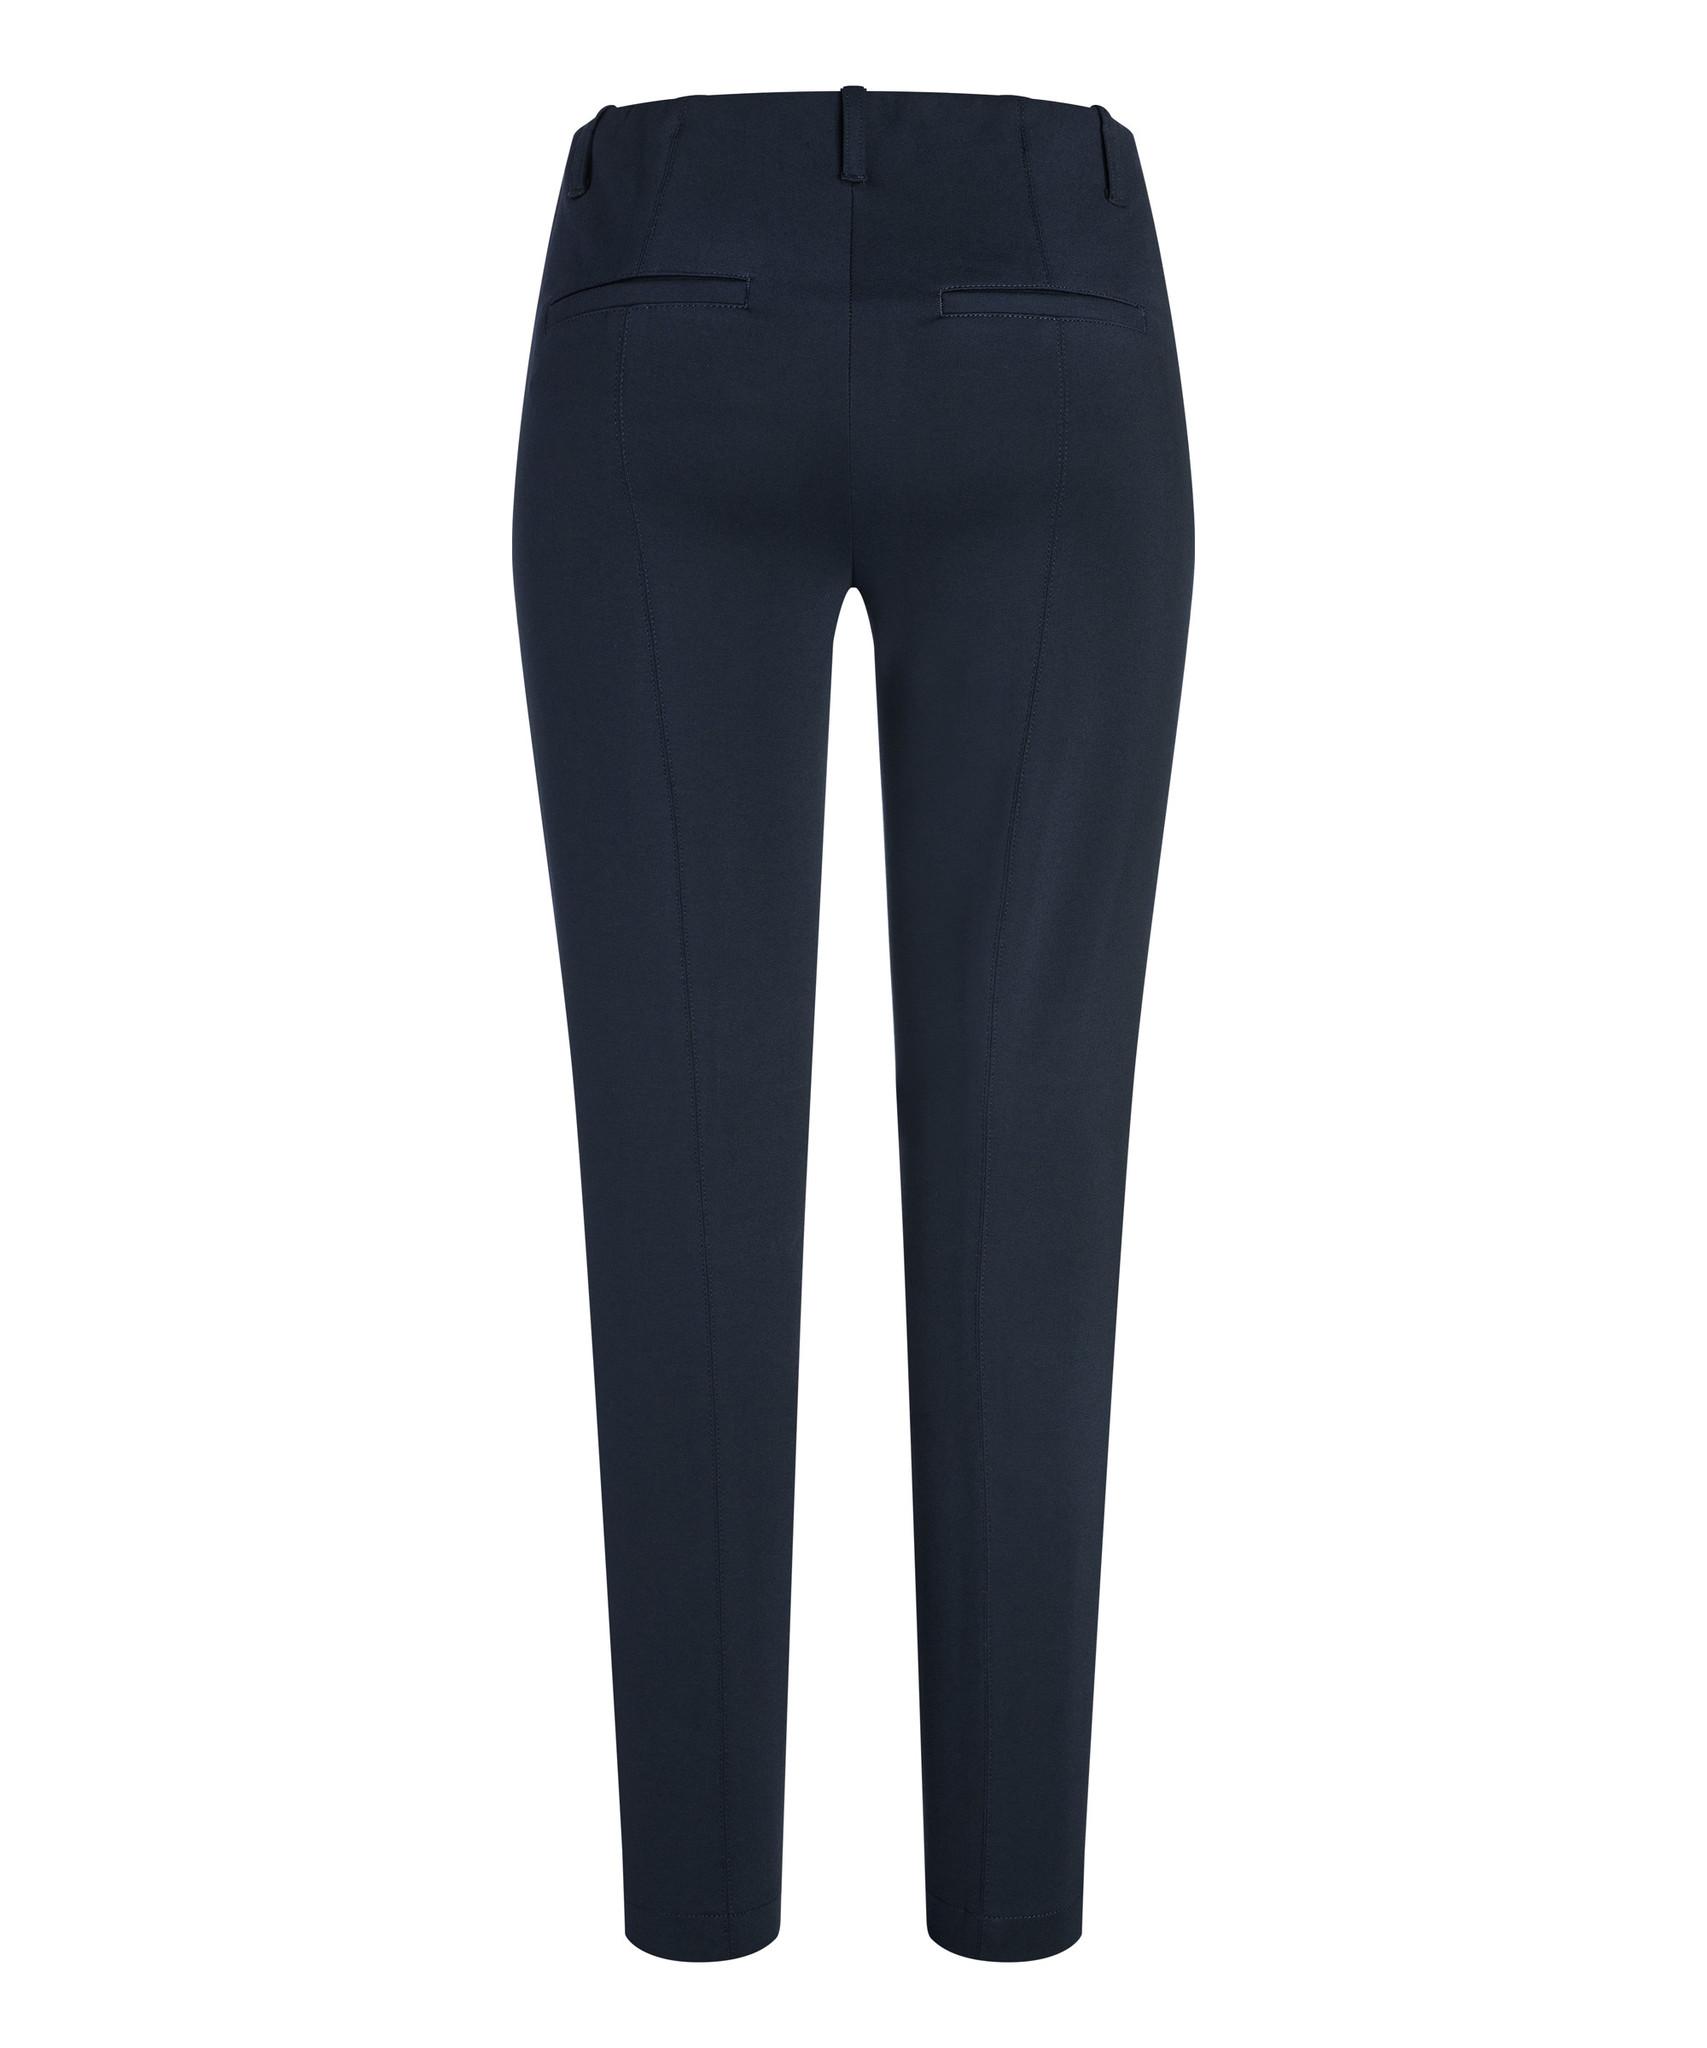 Cambio trousers ROS SEAM 6332-2